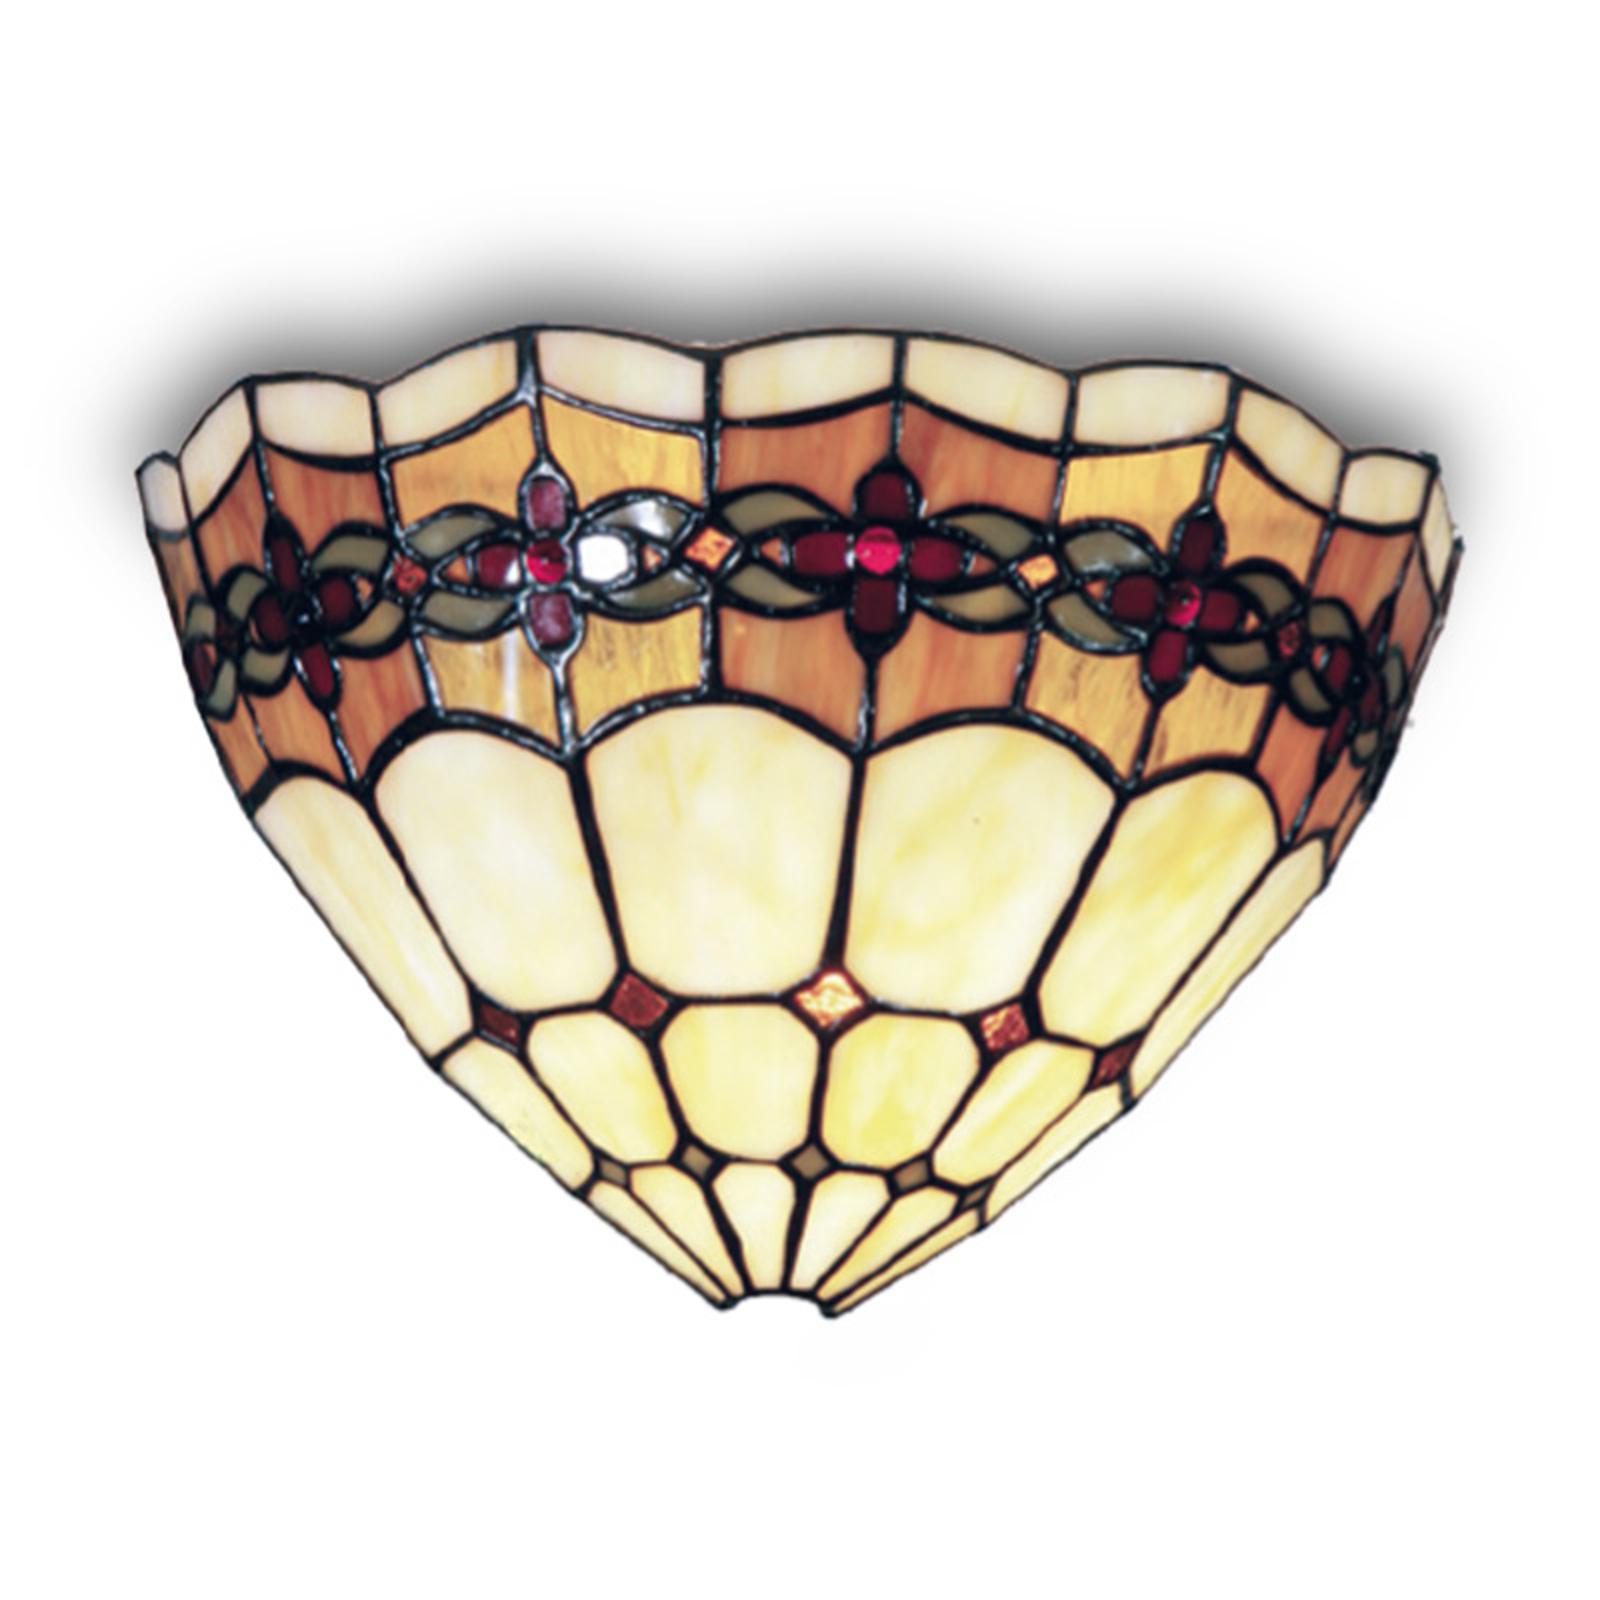 Lampada da parete Weena decorata in stile Tiffany